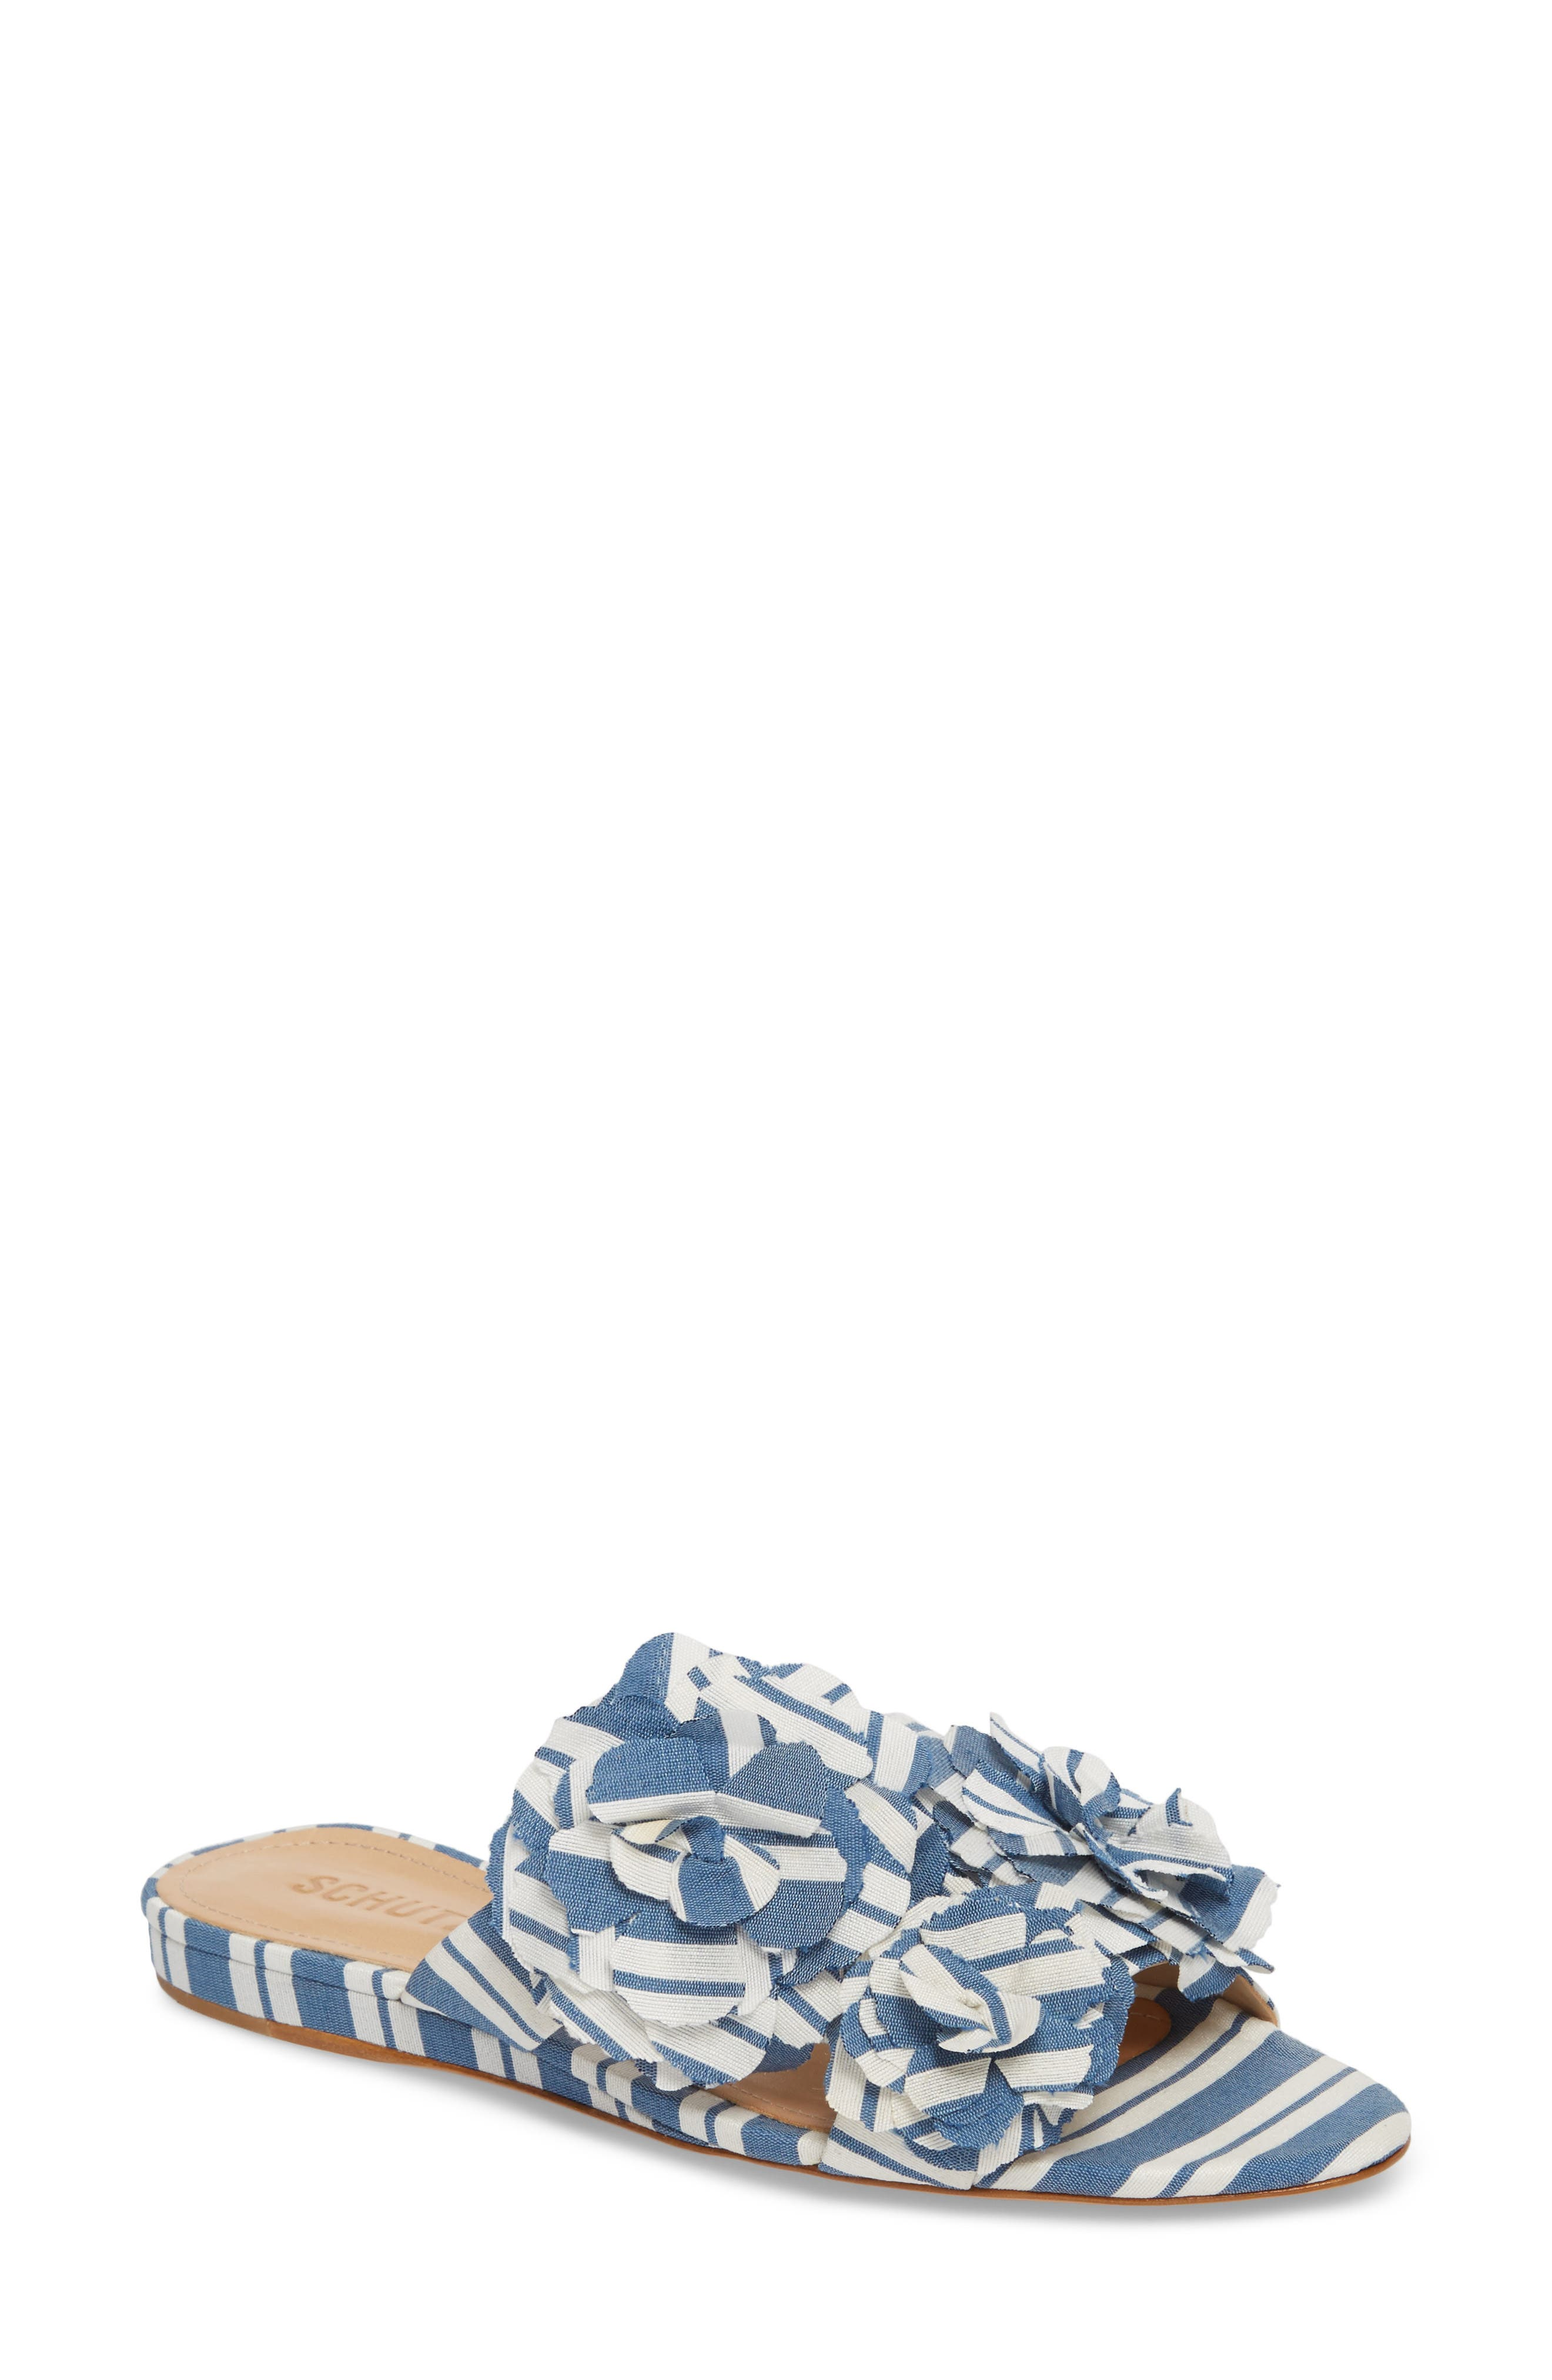 Main Image - Schutz Ilaria Flower Sandal (Women)